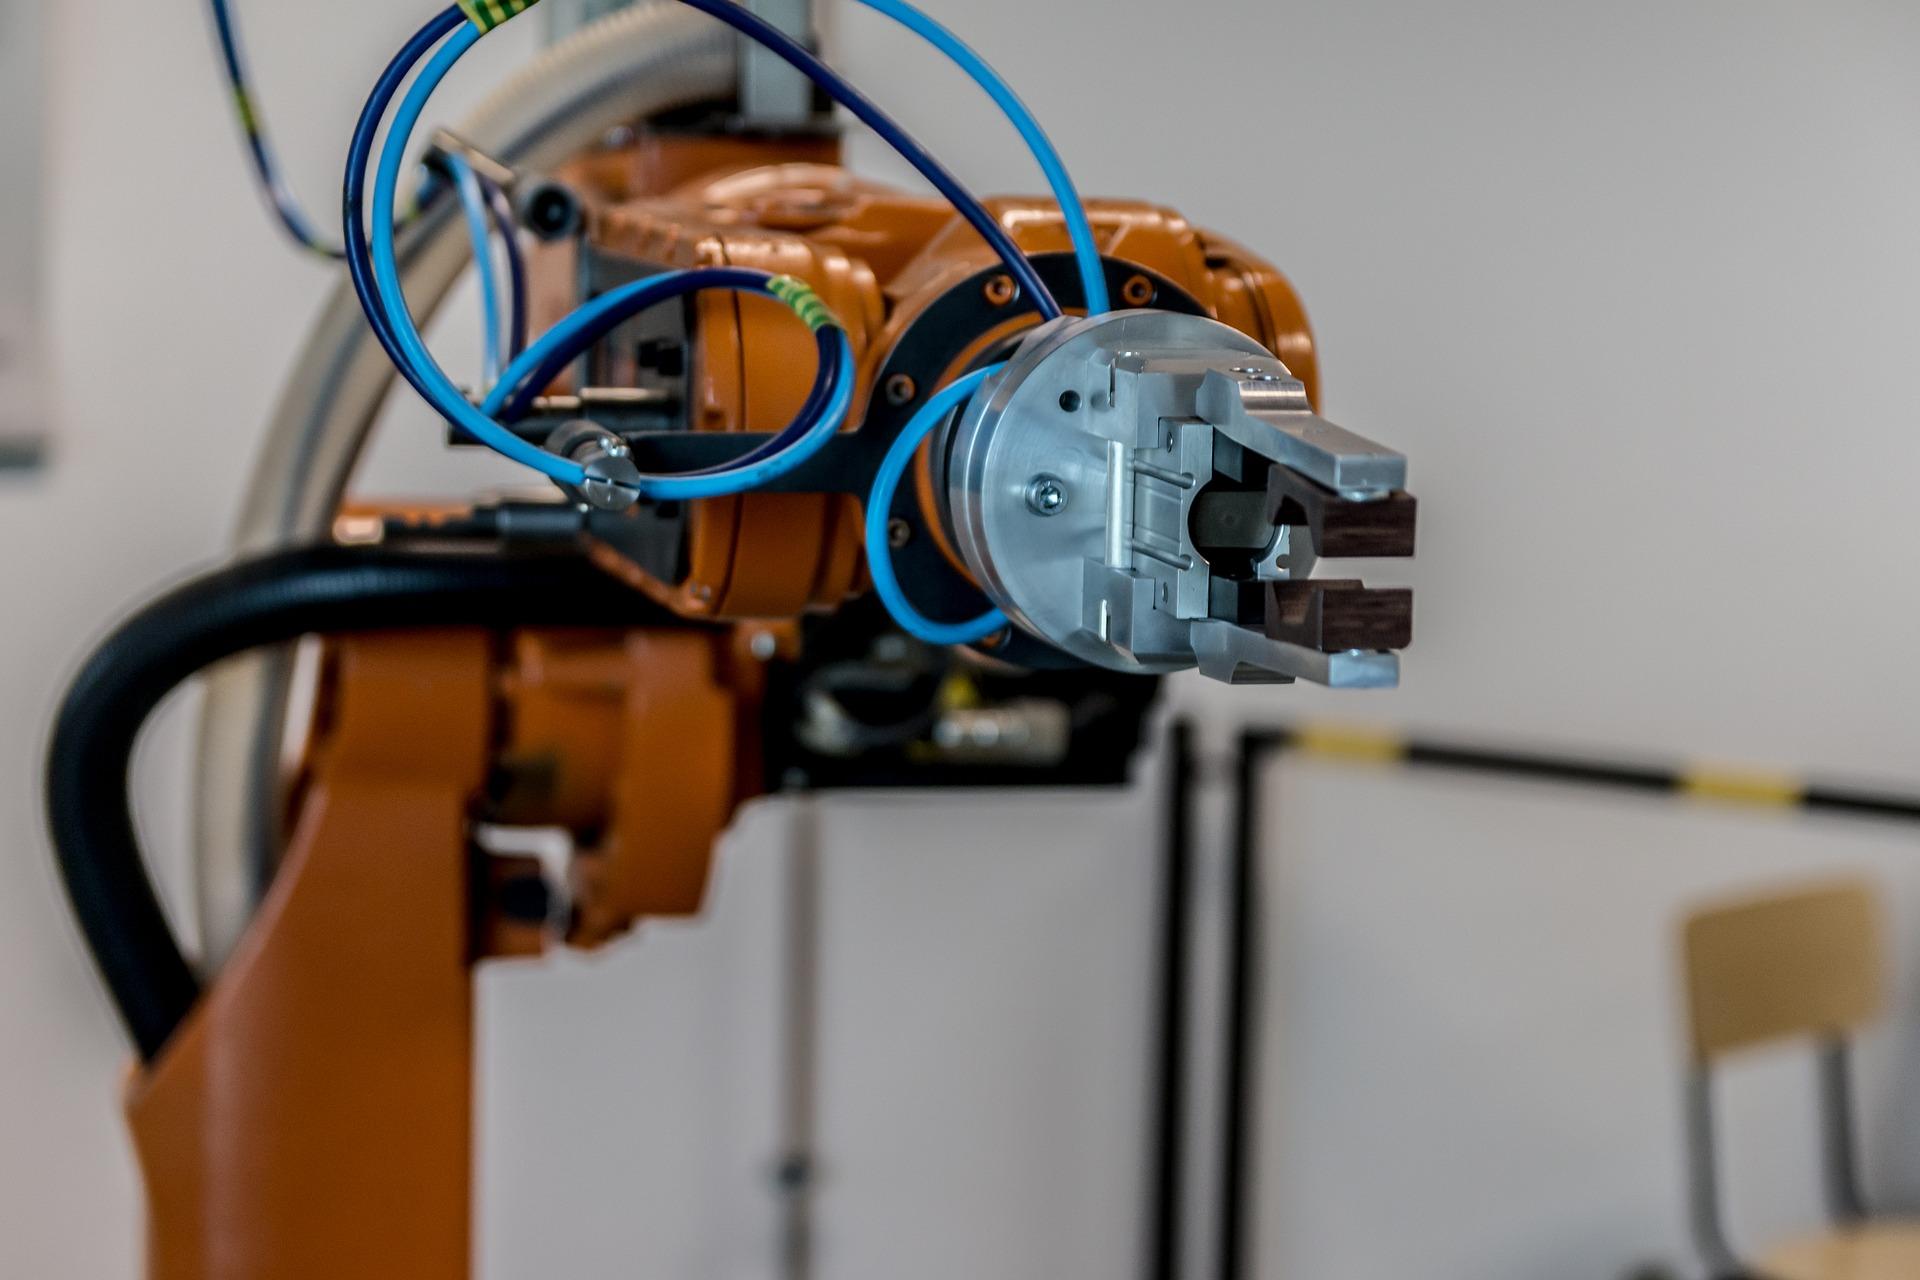 robot tokyo 2020-tokyo 2020-tecnologia tokyo 2020-ability channel-giochi olimpici tokyo 2020-giochi paralimpici tokyo 2020-giochi tokyo 2020